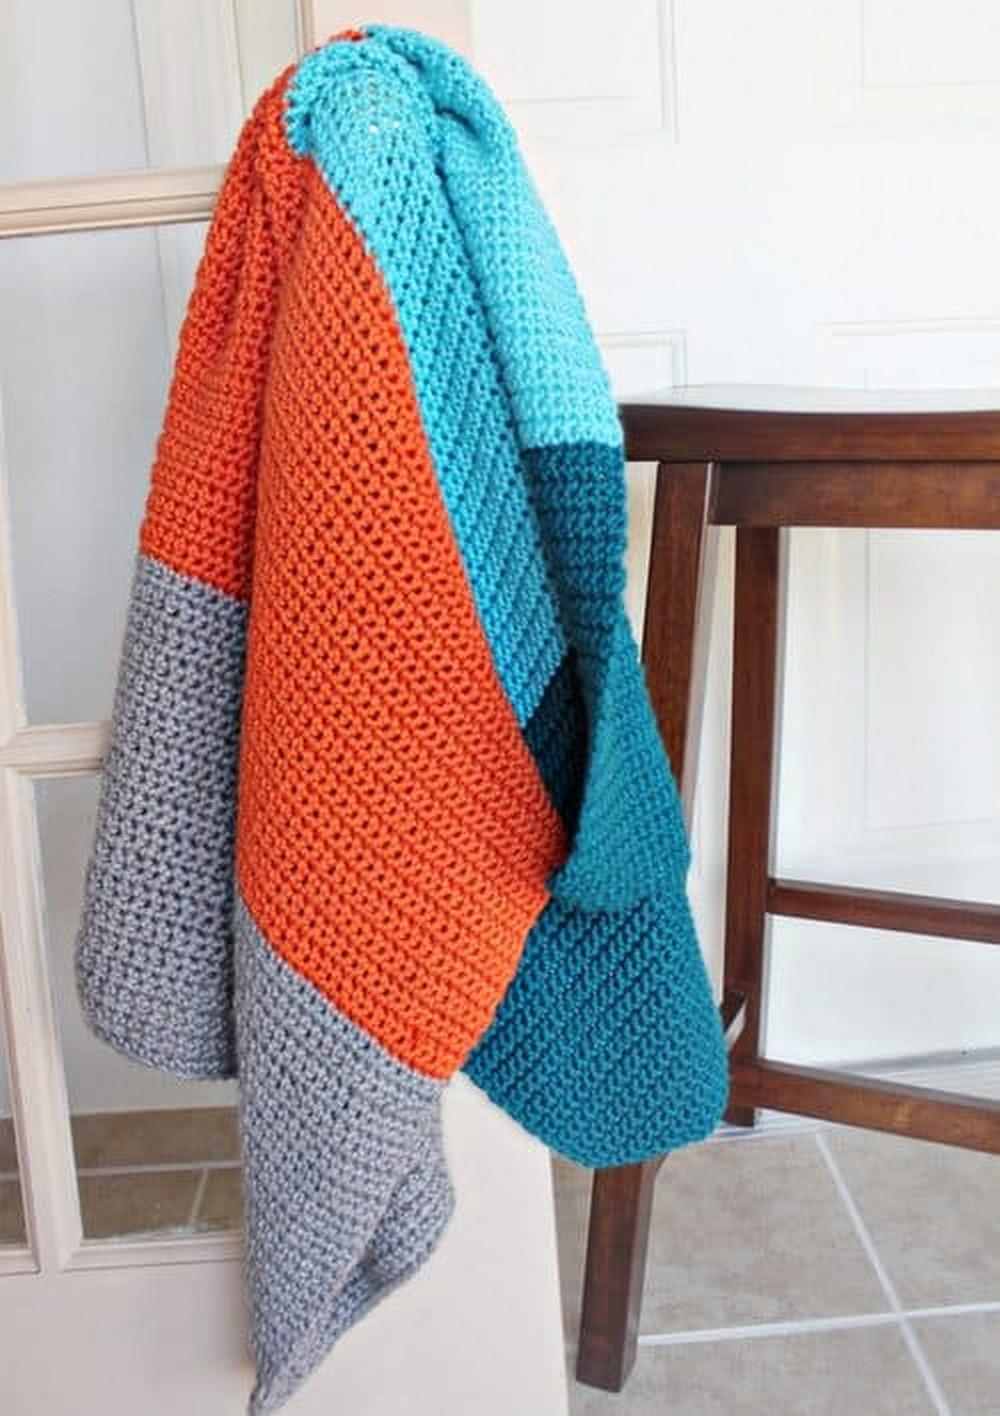 Colour-Blocked Simple Crochet Blanket Pattern